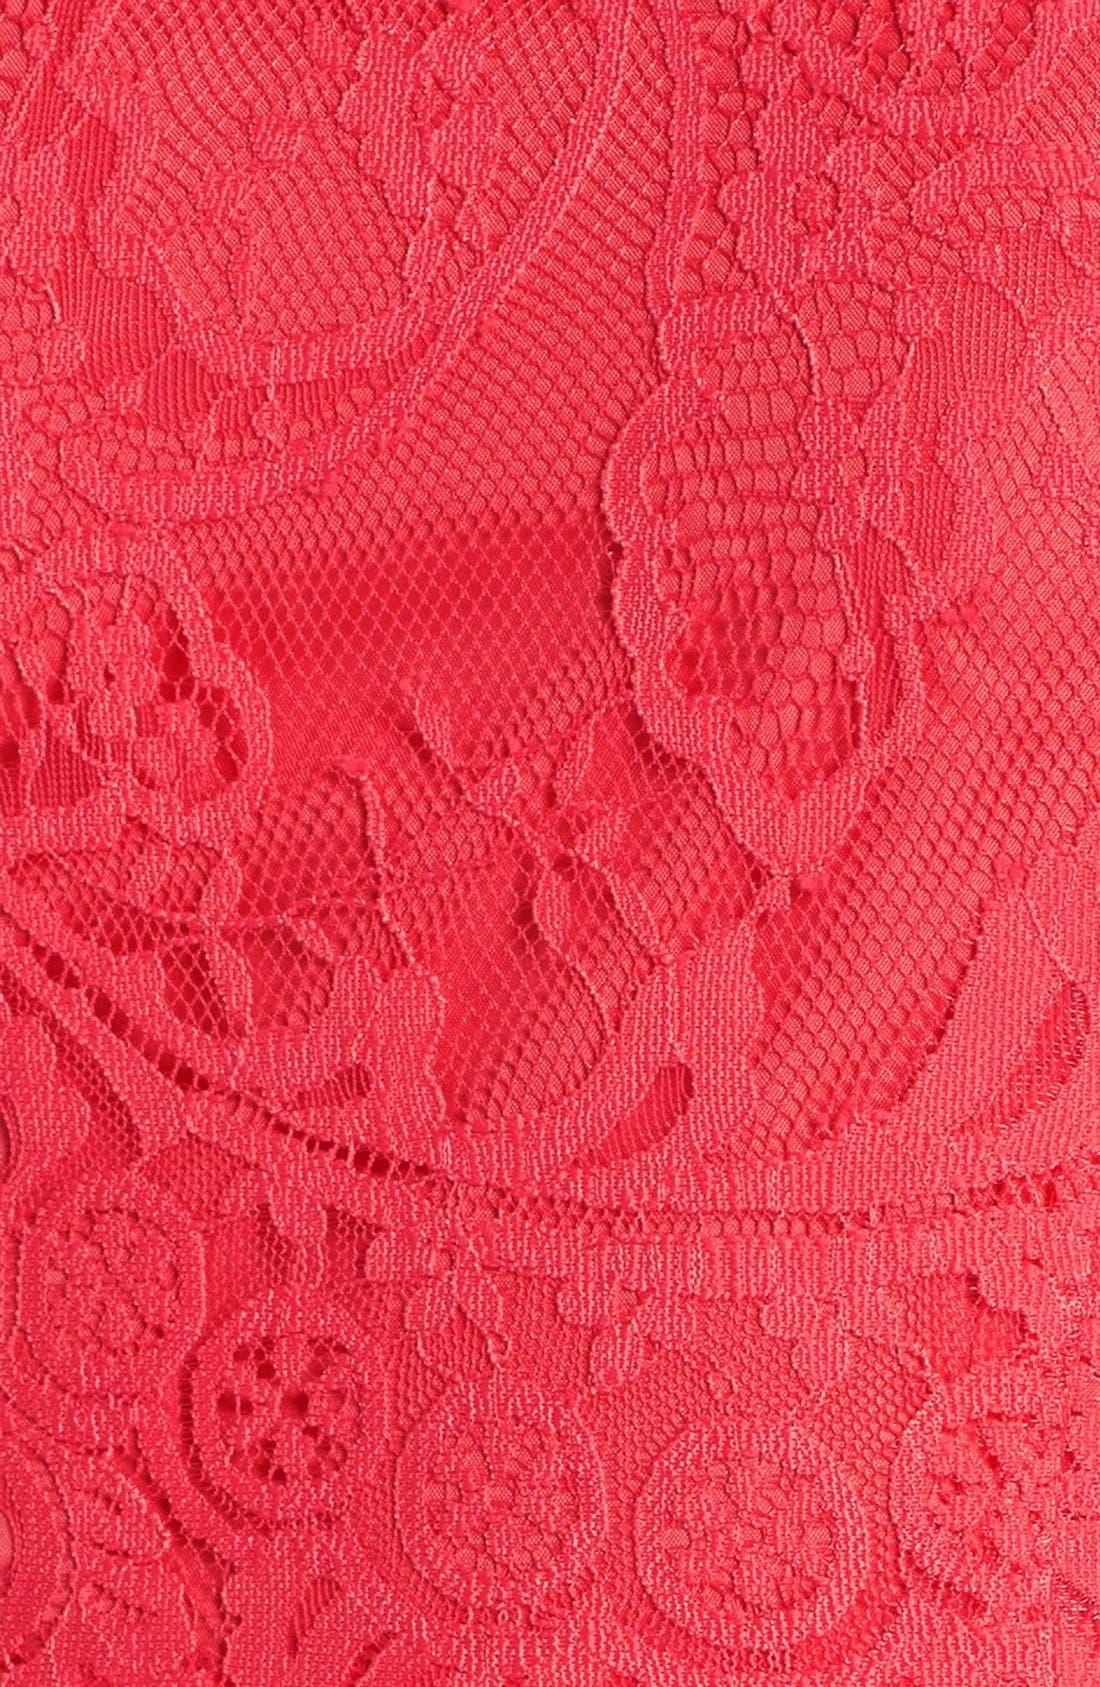 Alternate Image 5  - BB Dakota 'Rhianna' Illusion Yoke Lace Fit & Flare Dress (Nordstrom Exclusive)